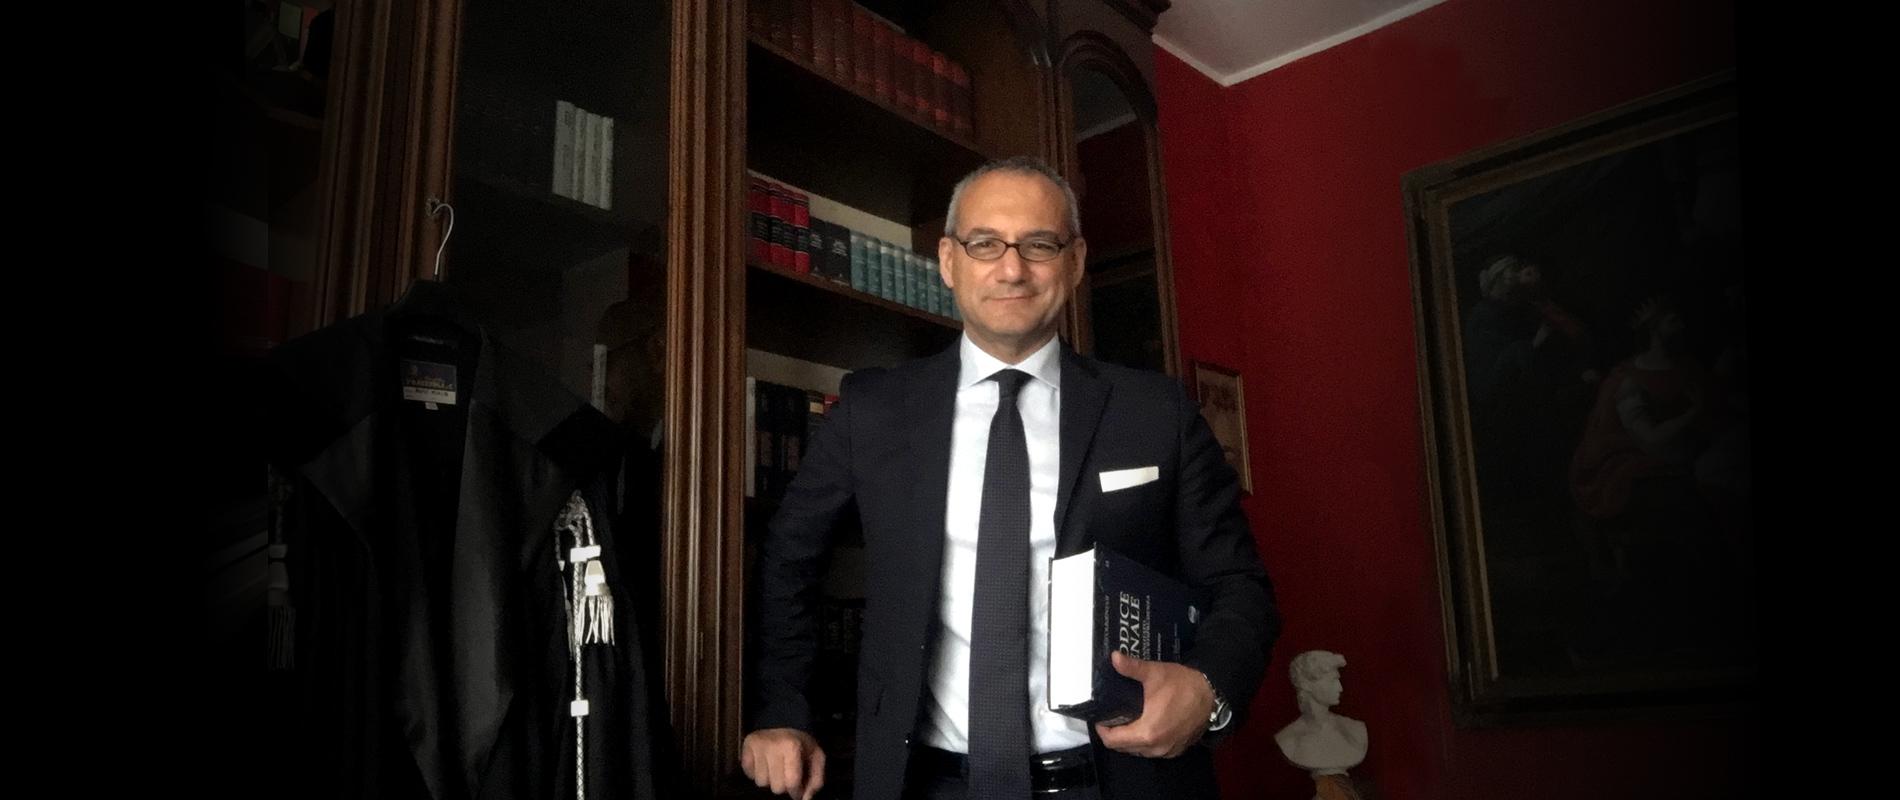 L' Avvocato Giuseppe Maio